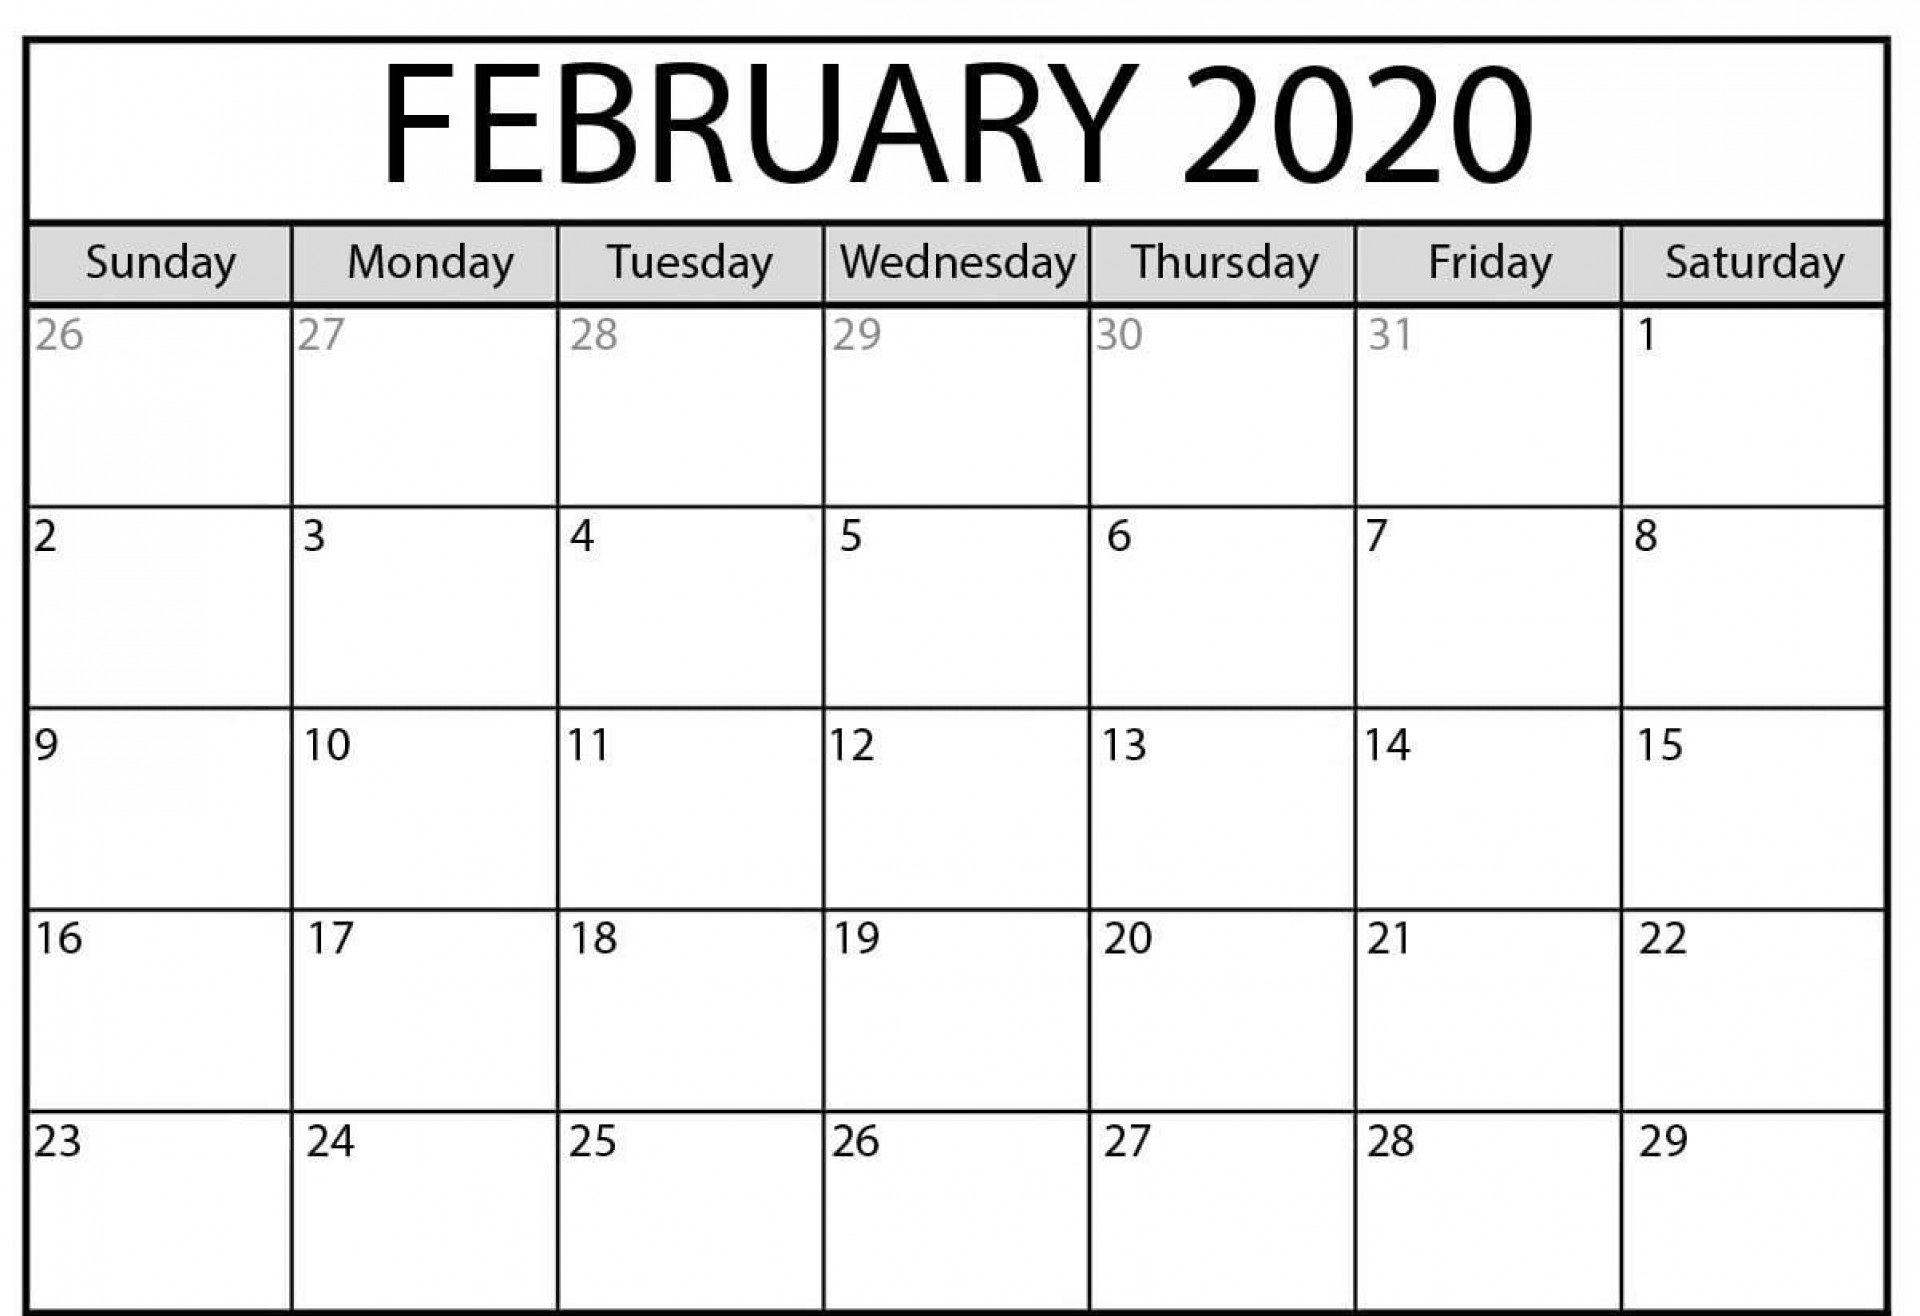 004 Wonderful 2020 Monthly Calendar Template Highest Quality  Templates Word Australian Free1920